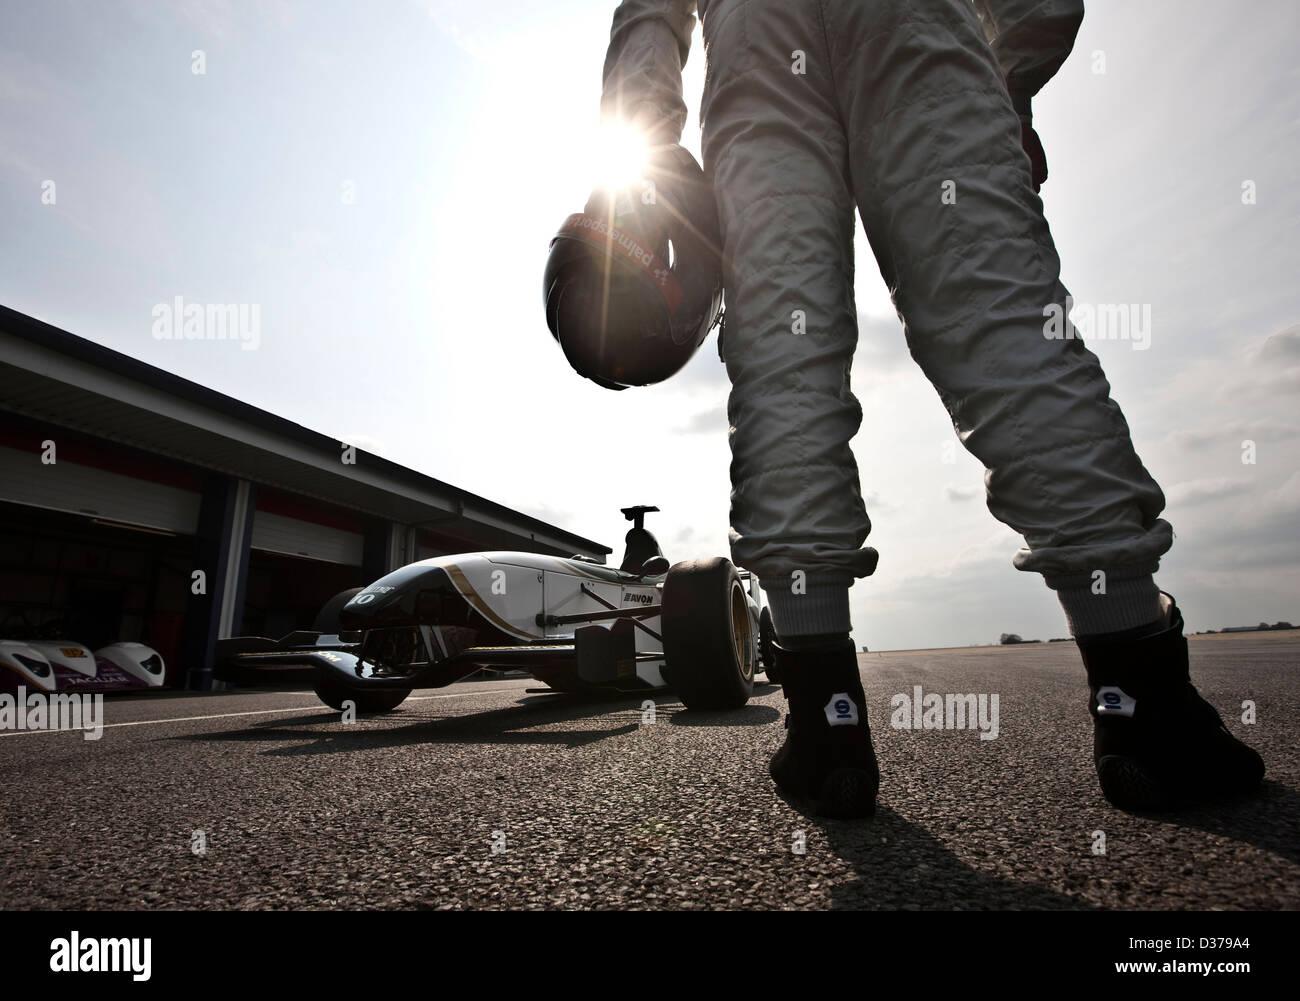 James Martin standing with Formula one Jaguar racing car, Bedford autodrome, UK 12 04 10 - Stock Image